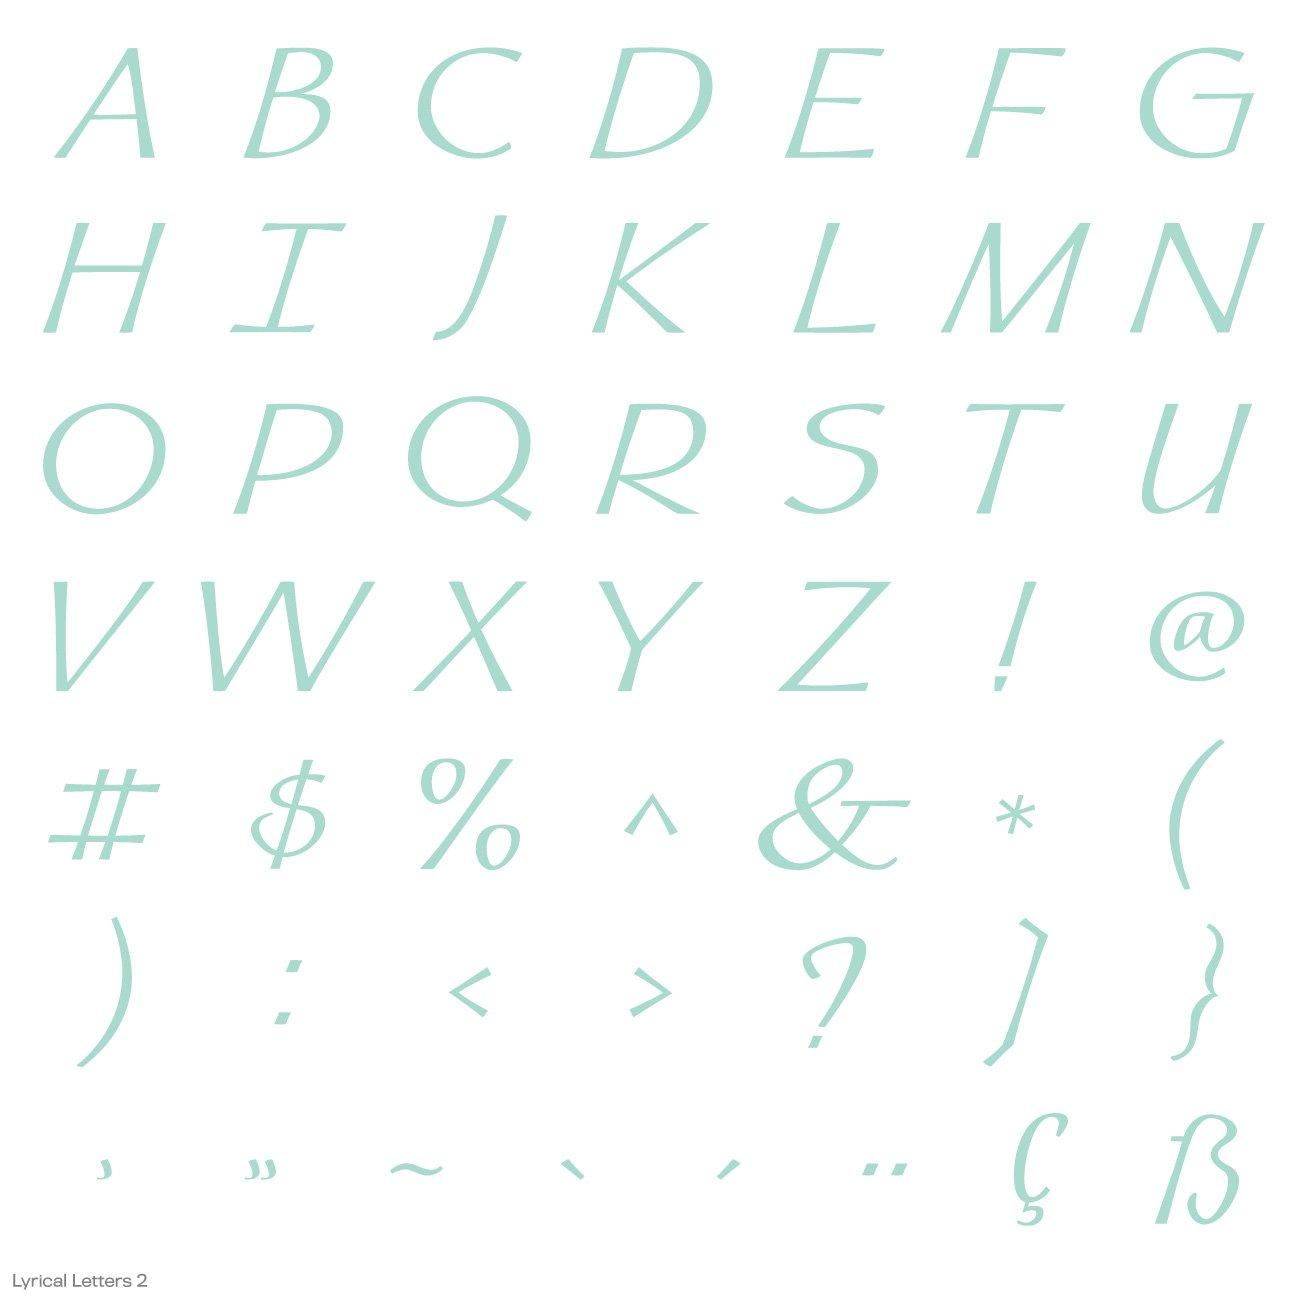 Cricut Lyrical Letters 2 Cartridge by Cricut (Image #21)